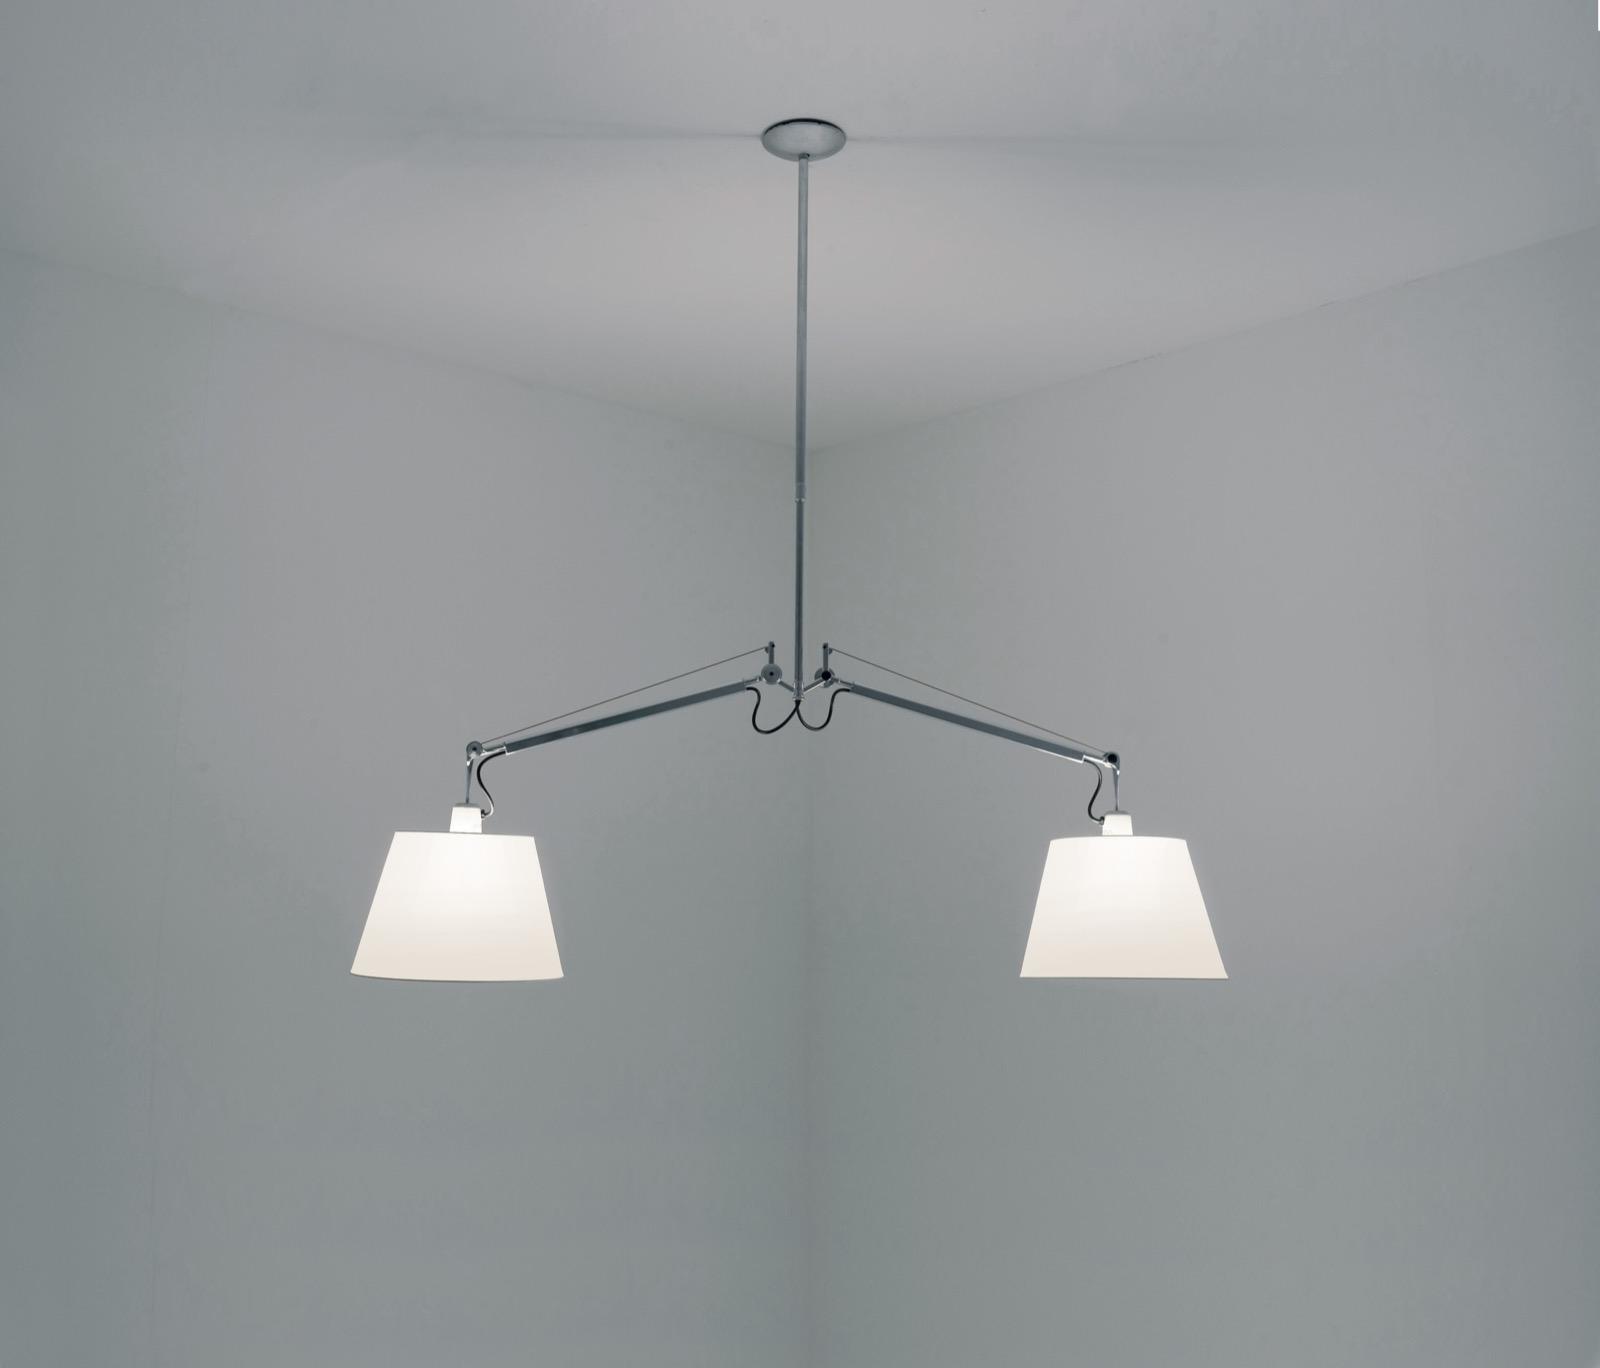 Artemide Tolomeo plafondlamp   Matser